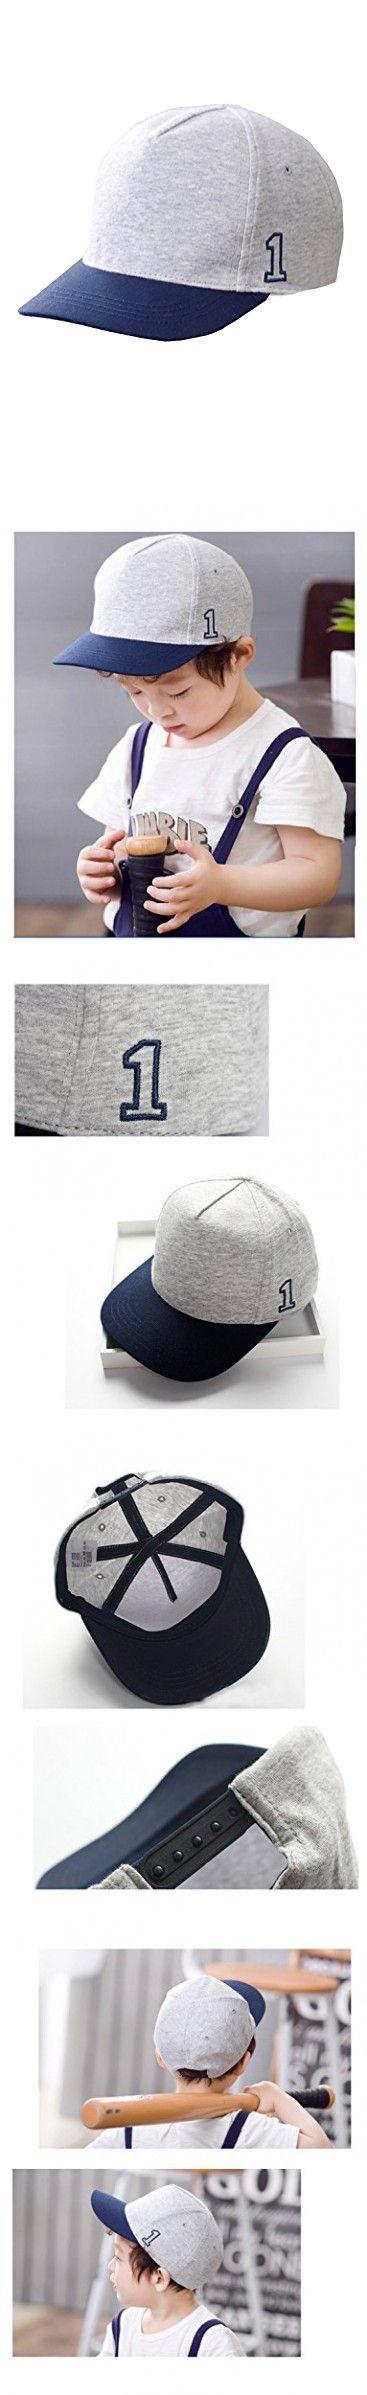 0m-4T BonjourMrsMr Baby Boys Baseball Cap,with Col No.1 Embroidery Sun Visor Kids Hat